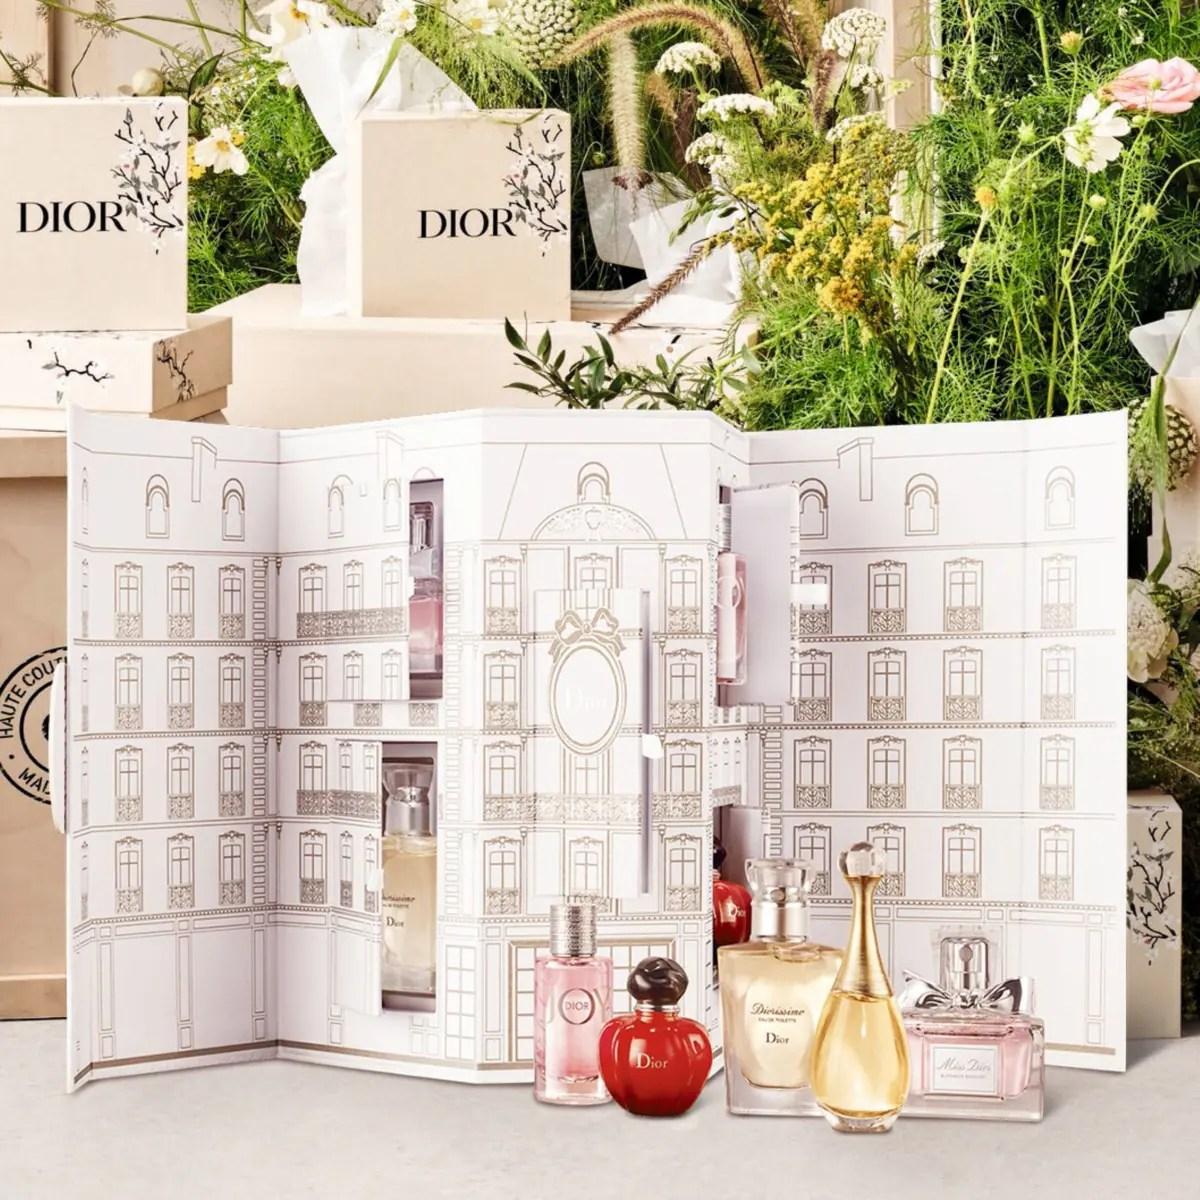 Dior - ディオール モンテーニュ コフレ (オンラインブティック数量限定品) 5種類のディオールを代表するフレグランスがセットされた、贅沢なコフレ